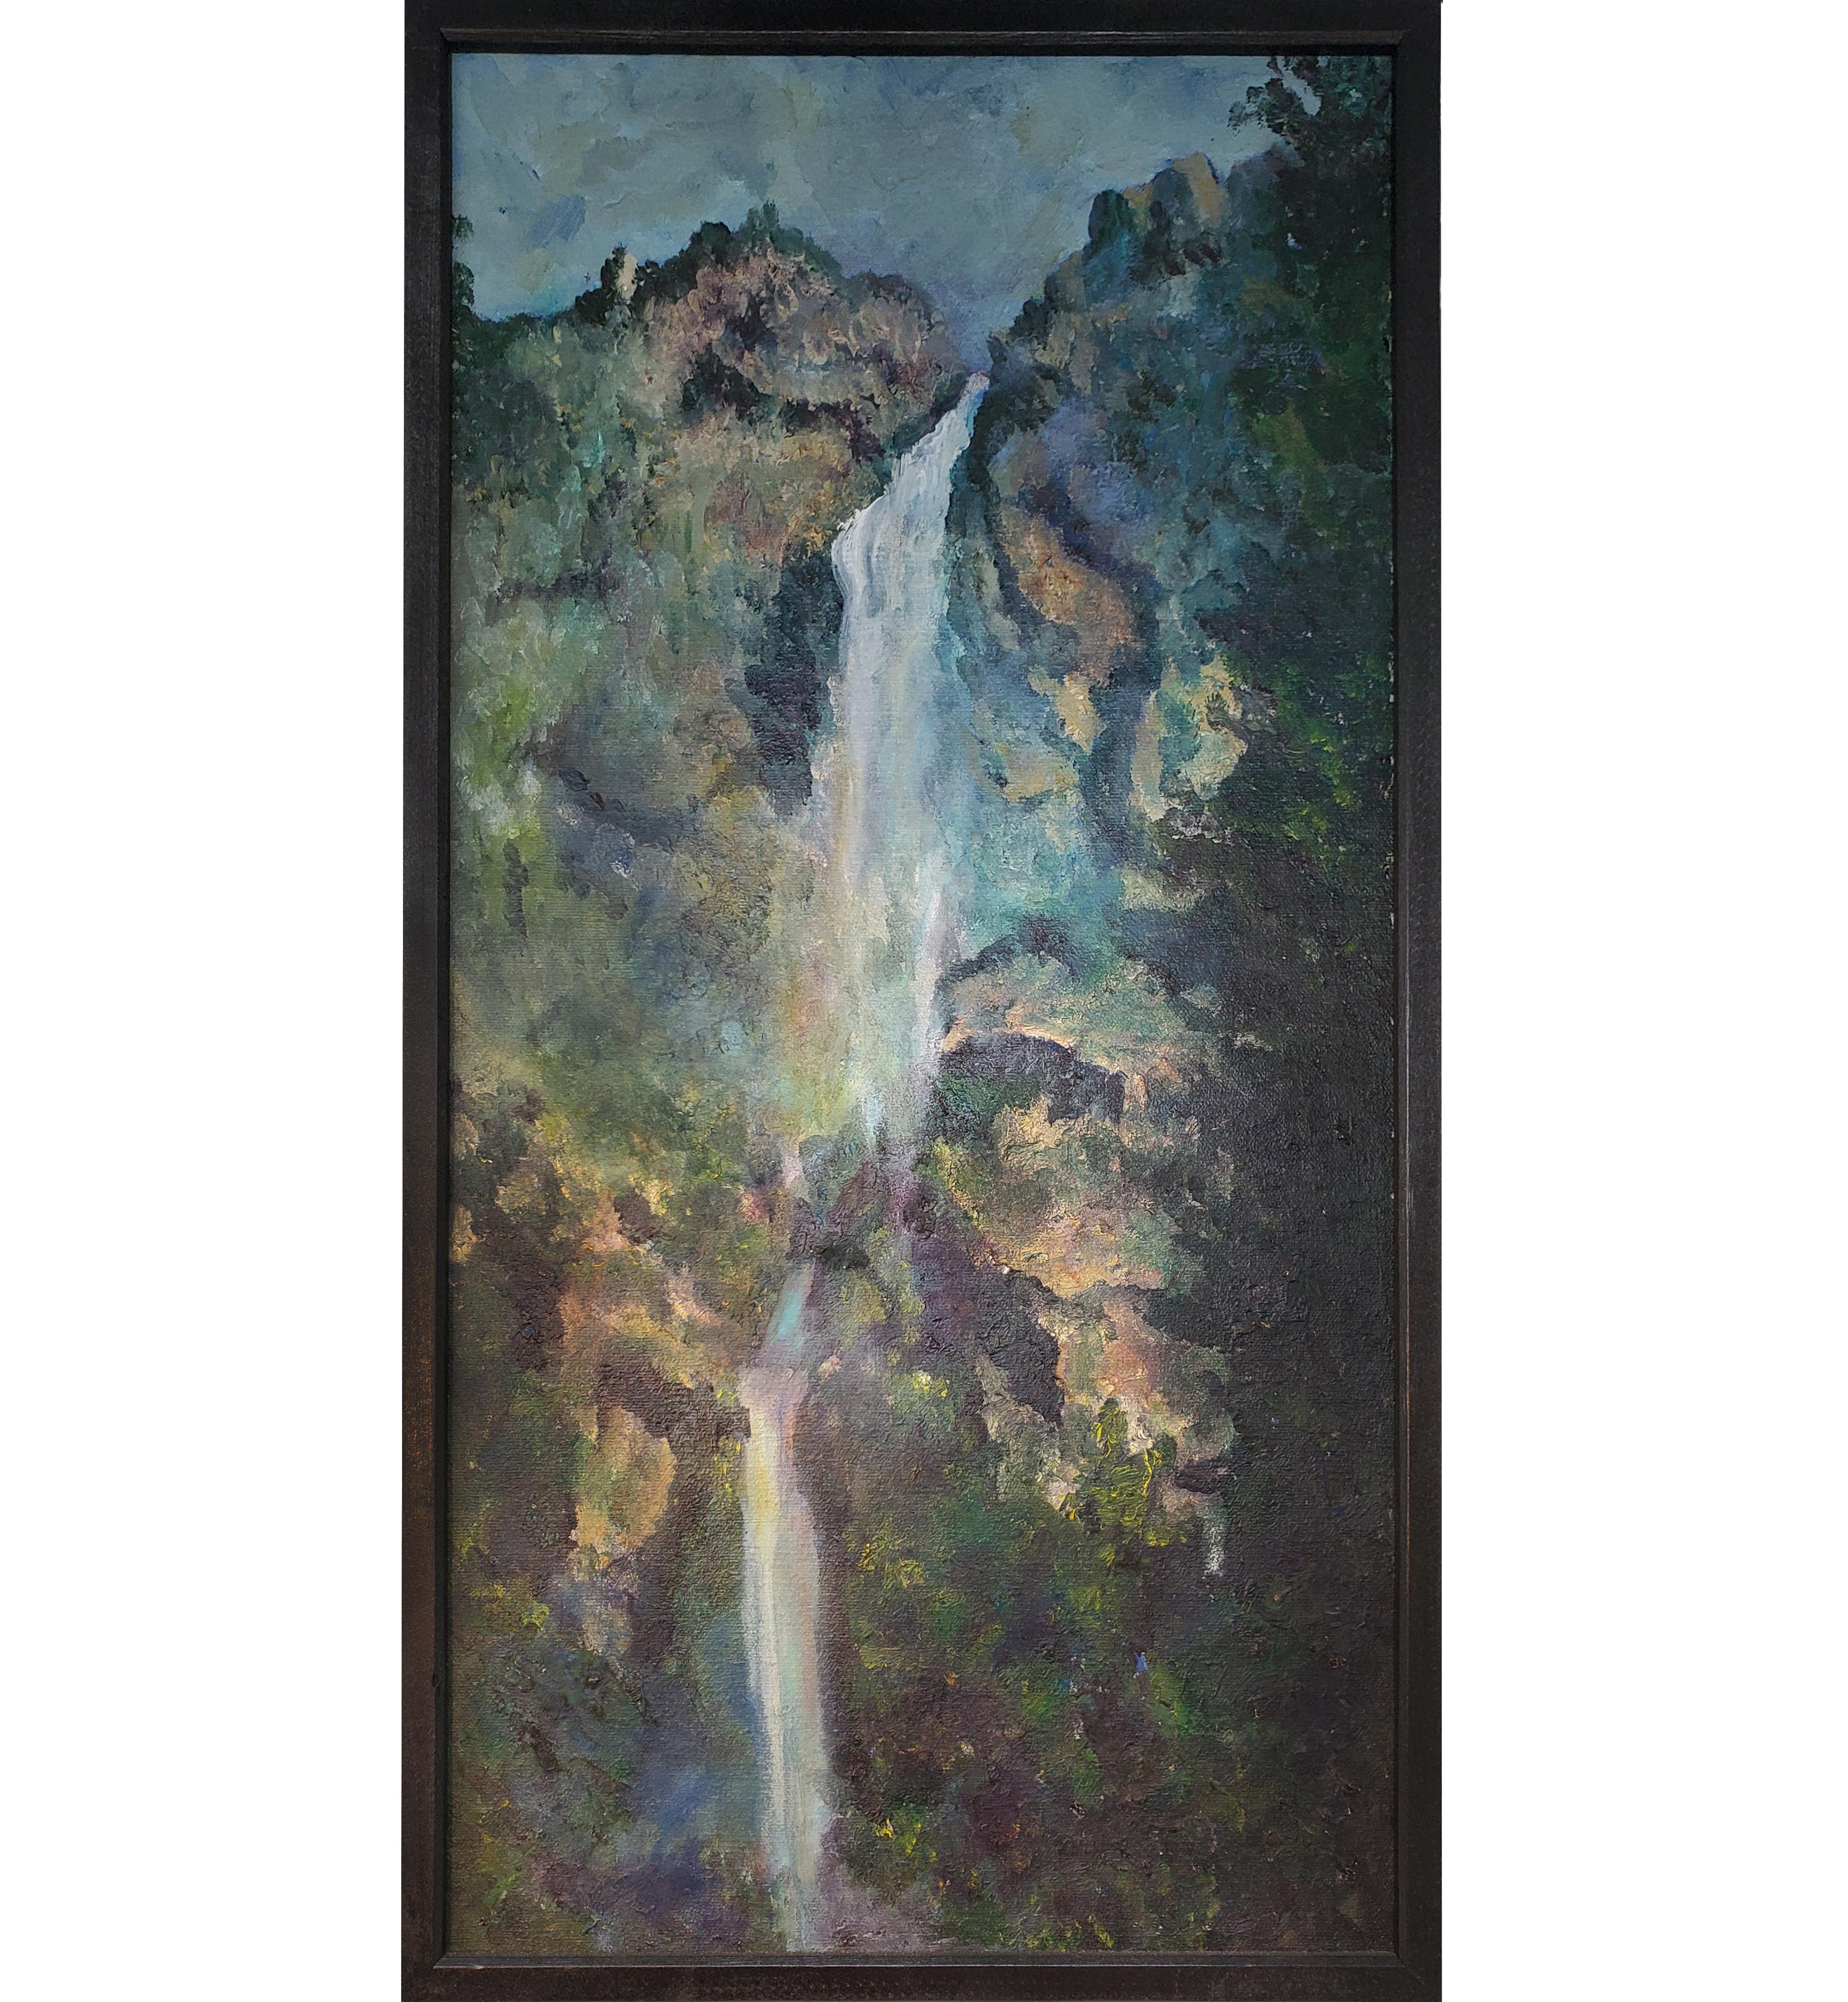 waterfall-painting-large.jpg